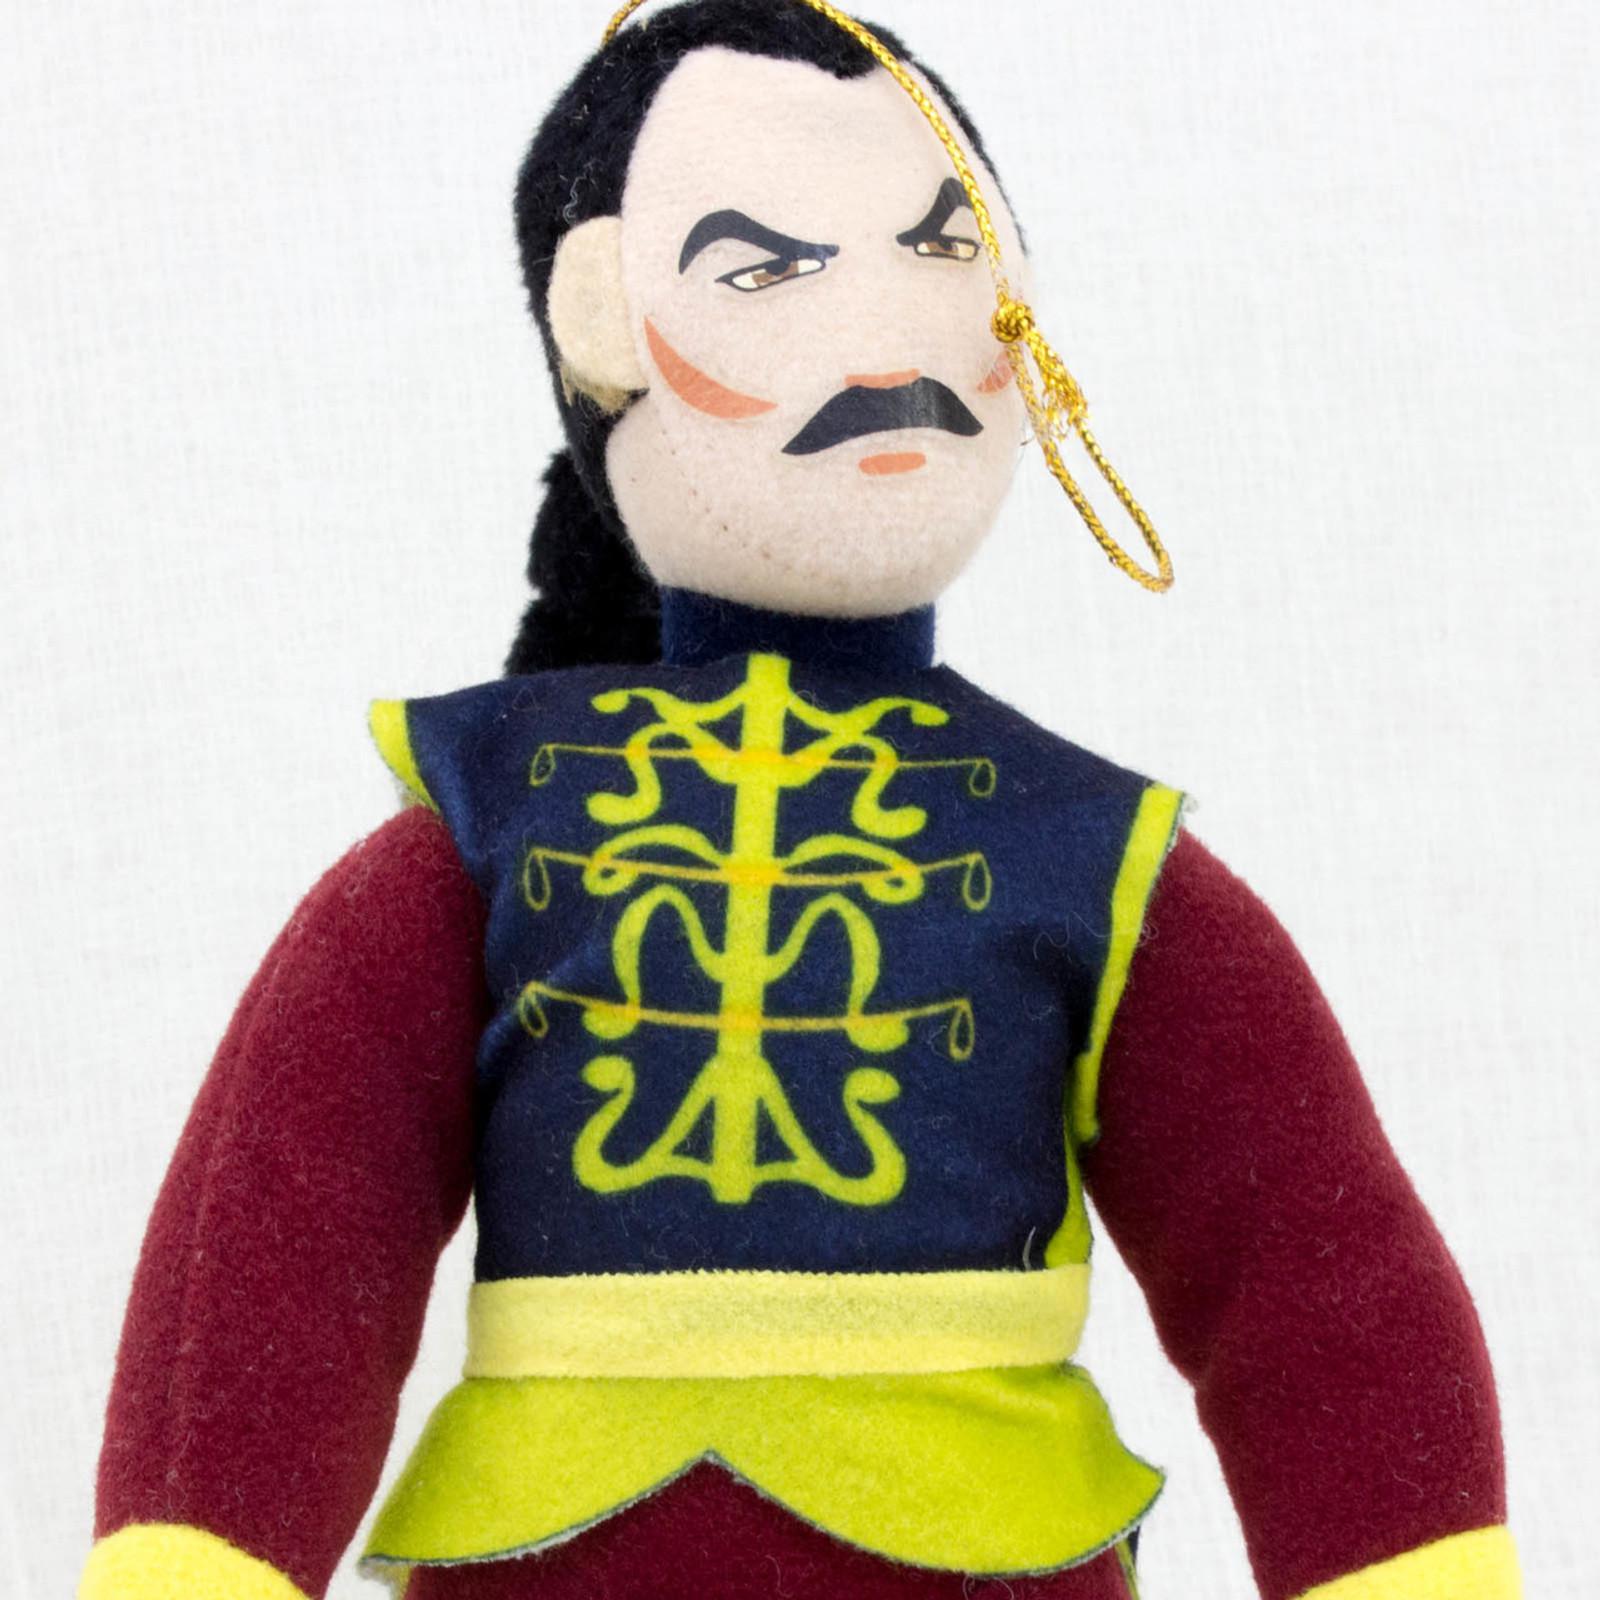 "Virtua Fighter 2 Lau Chan 10"" Plush Doll SEGA 1995 JAPAN GAME FIGURE"